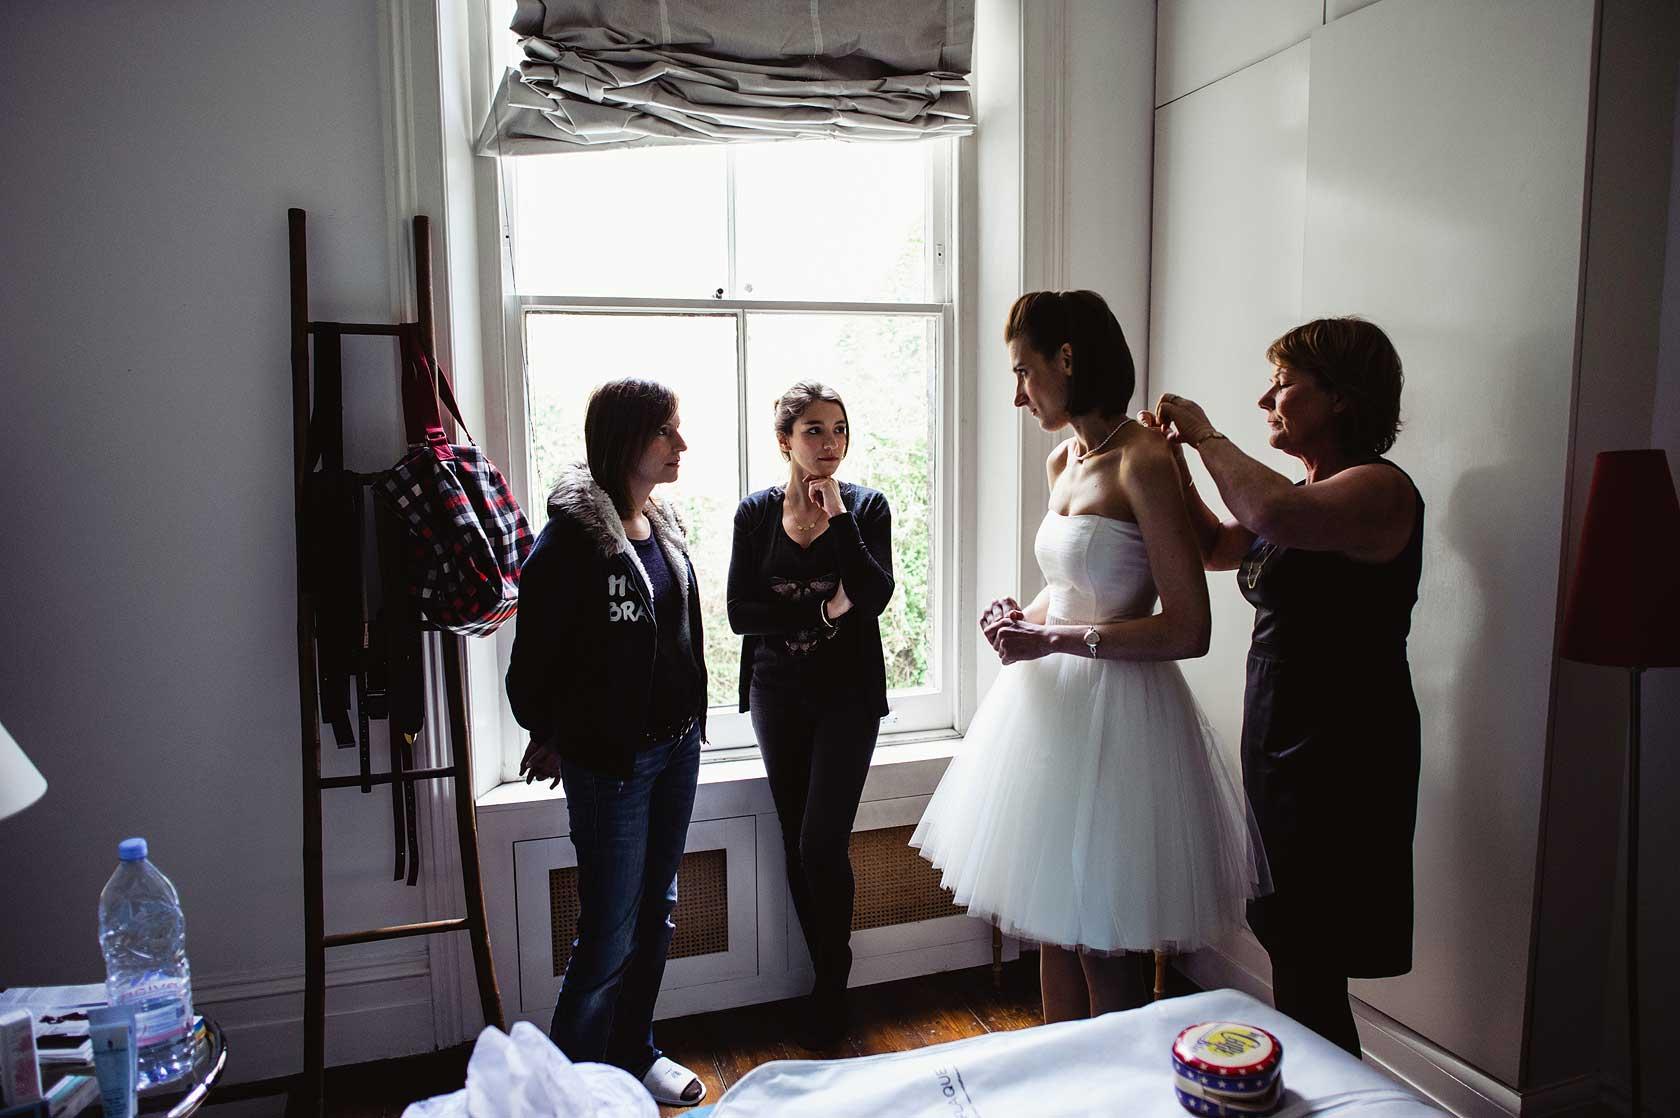 Wedding Photographer at Cheyne Walk Brasserie